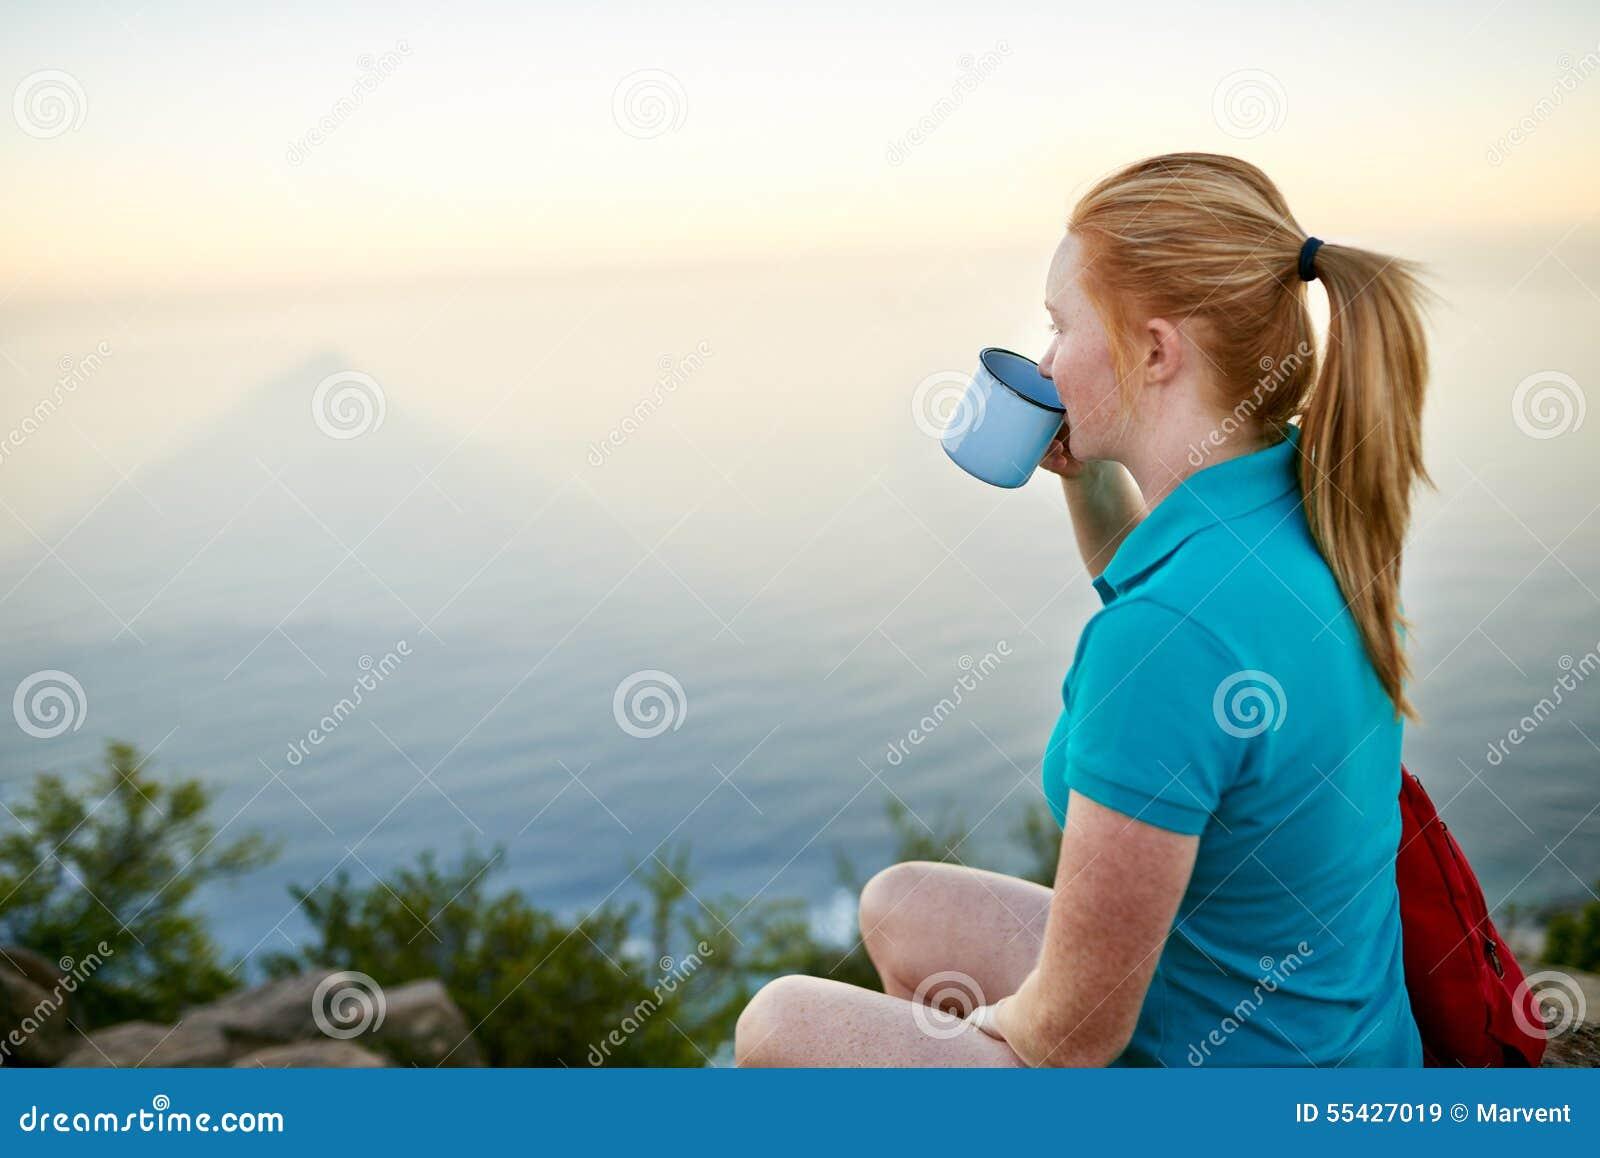 Junge Frau, die ruhig an ihrem Kaffee draußen nippt